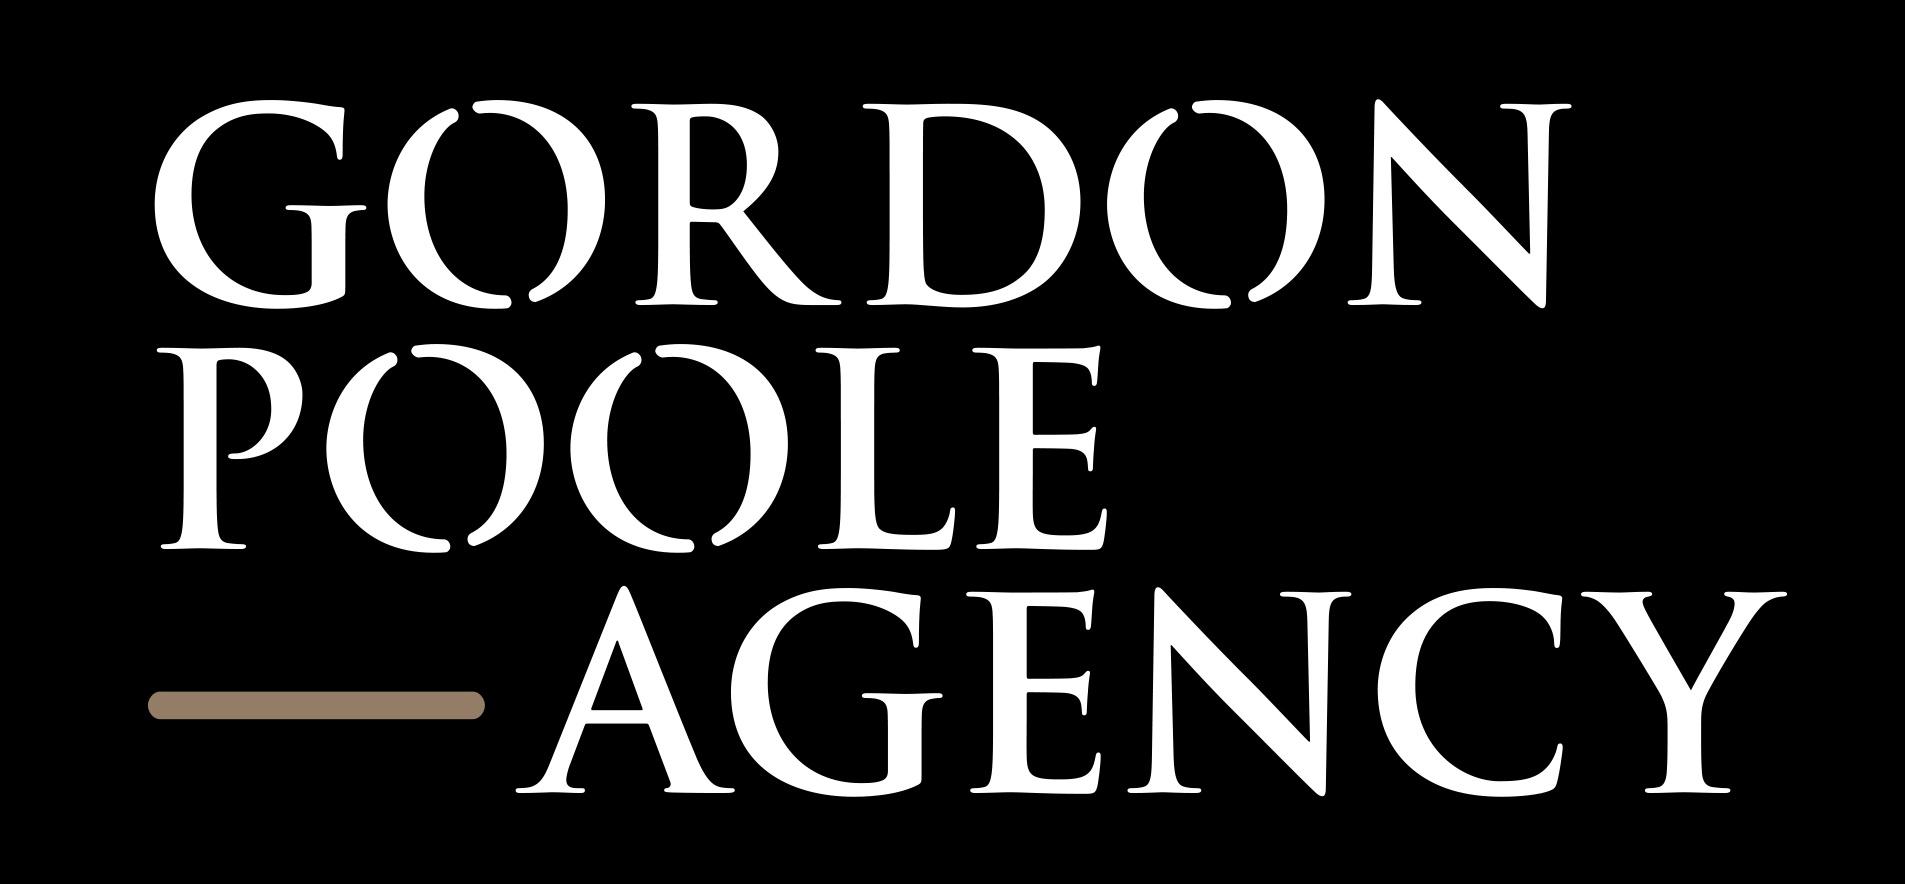 Gordon Poole Agency Logo